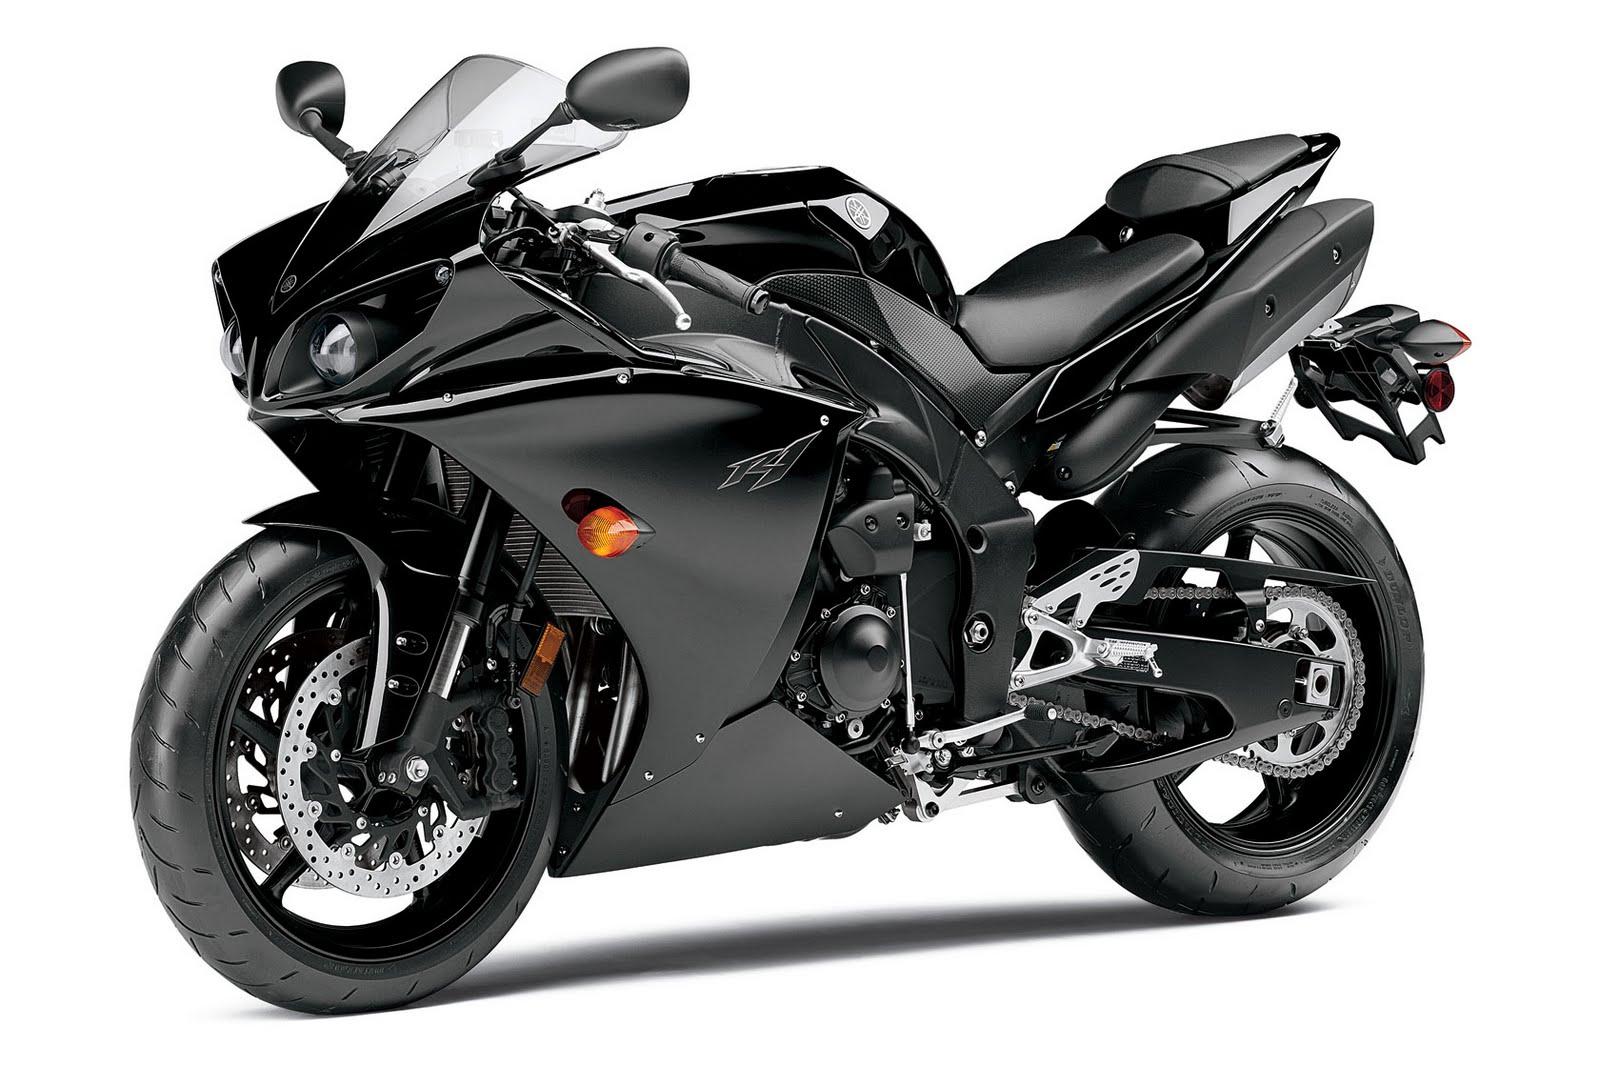 Gambar Motor Yamaha YZFR12011  GAMBAR WALLPAPER MOTOR